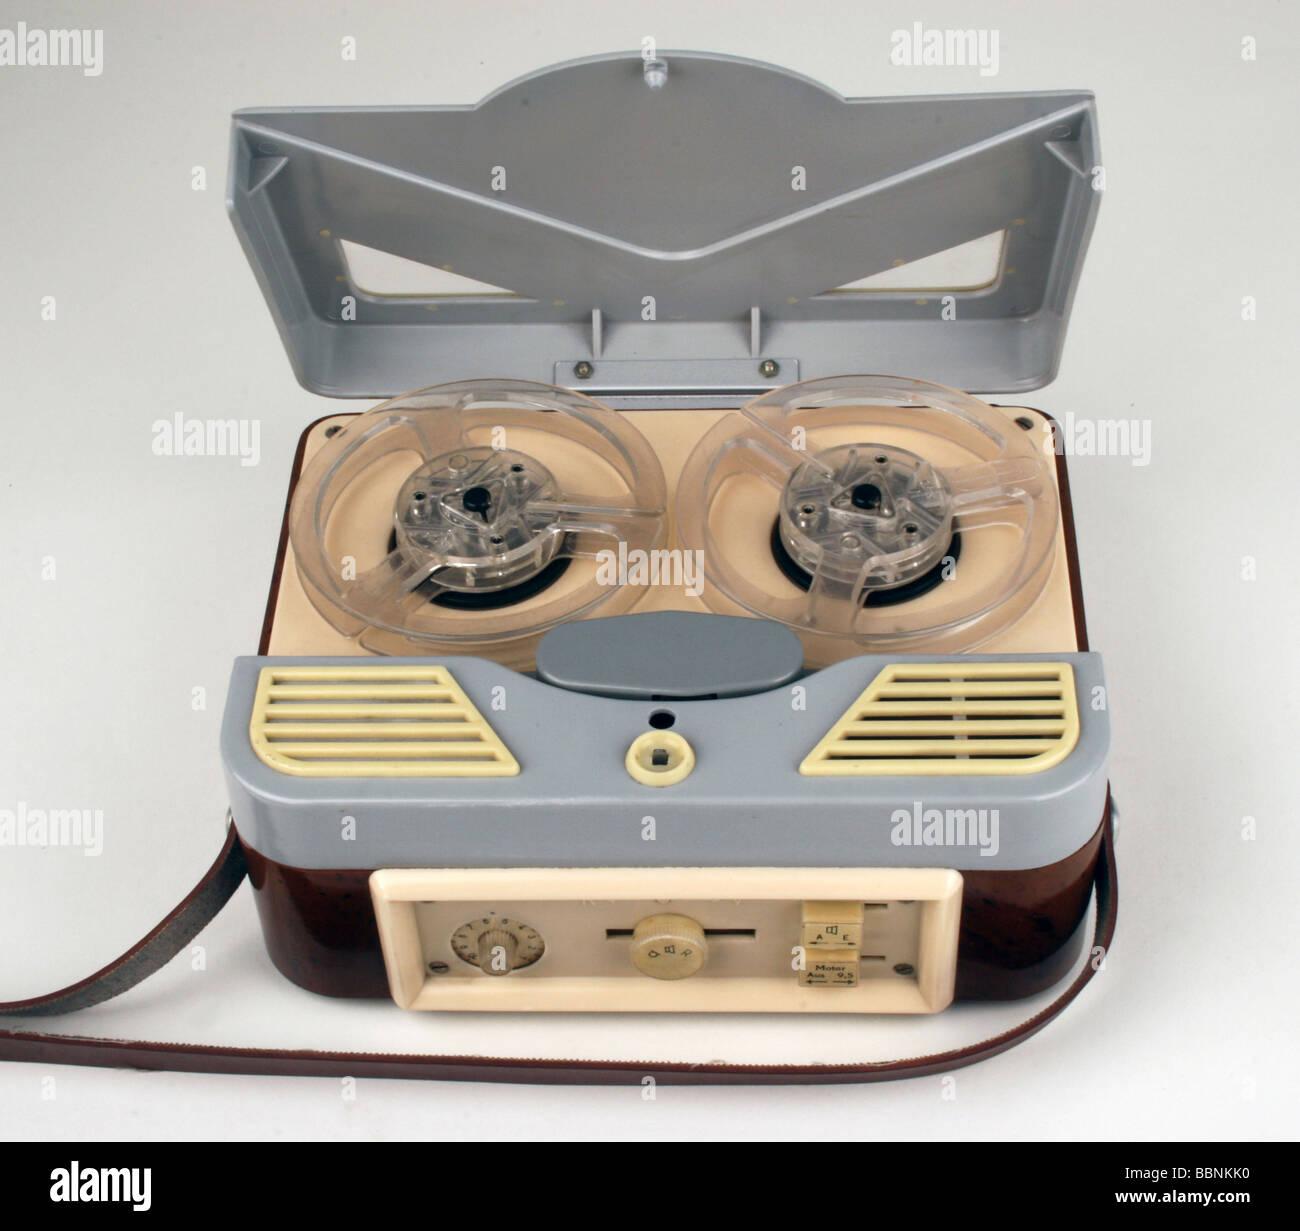 https://c8.alamy.com/comp/BBNKK0/technics-sound-tape-units-sound-tape-player-pouva-bndi-small-made-BBNKK0.jpg